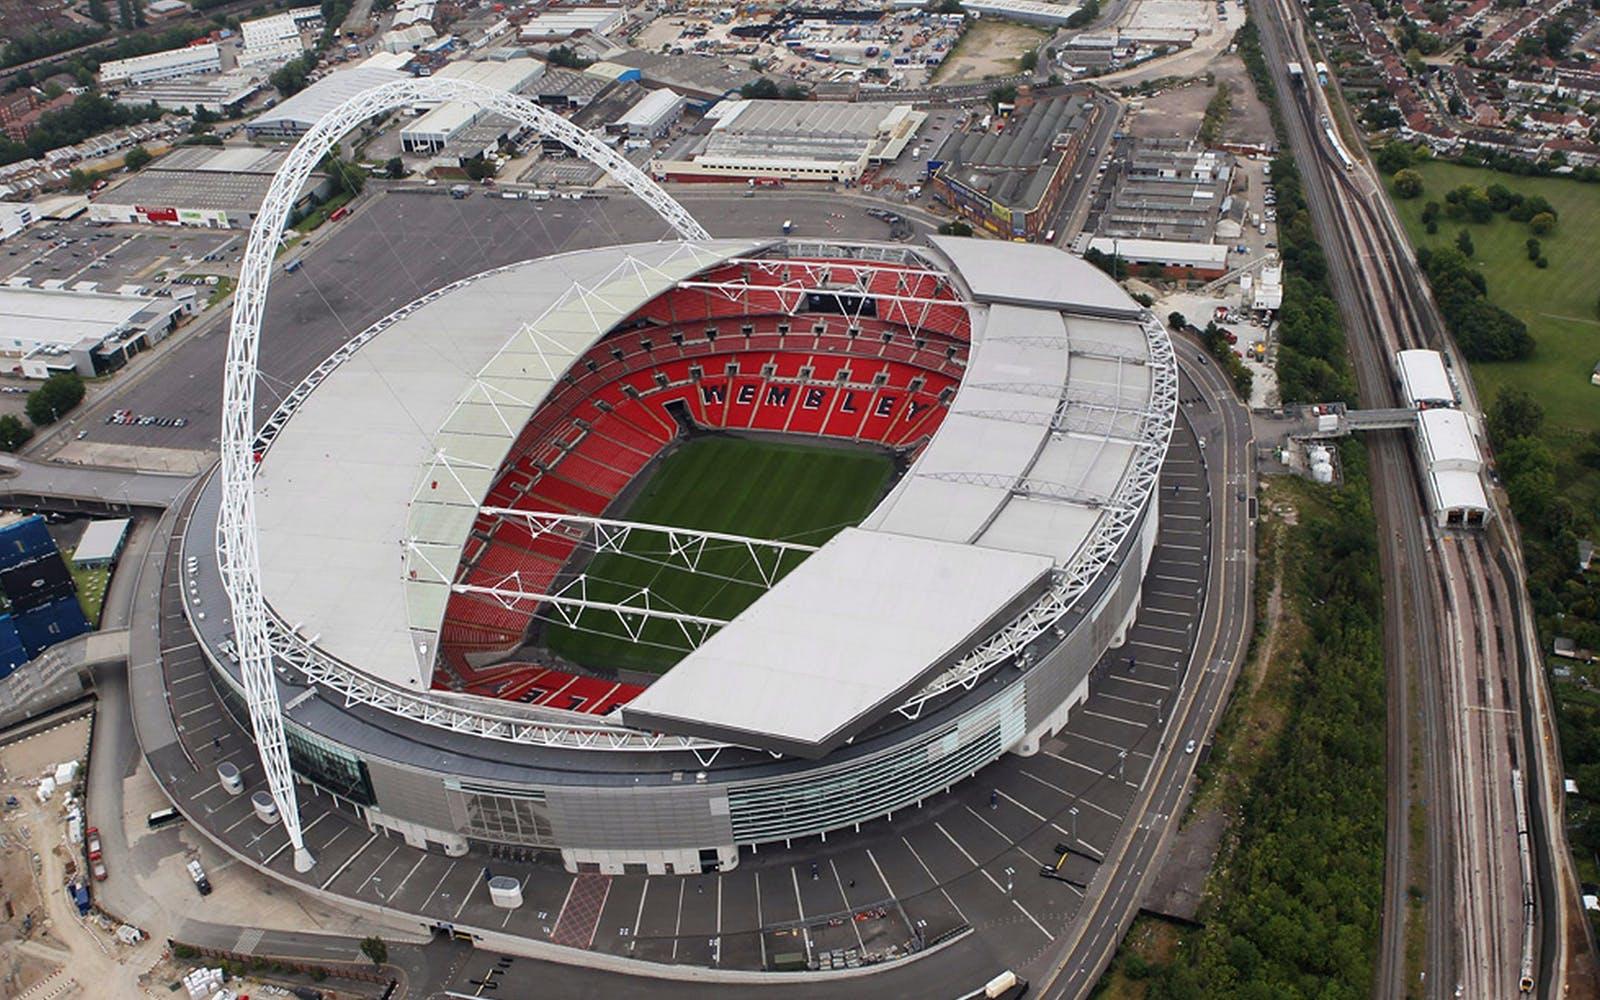 Wembley Stadium Guided Tour